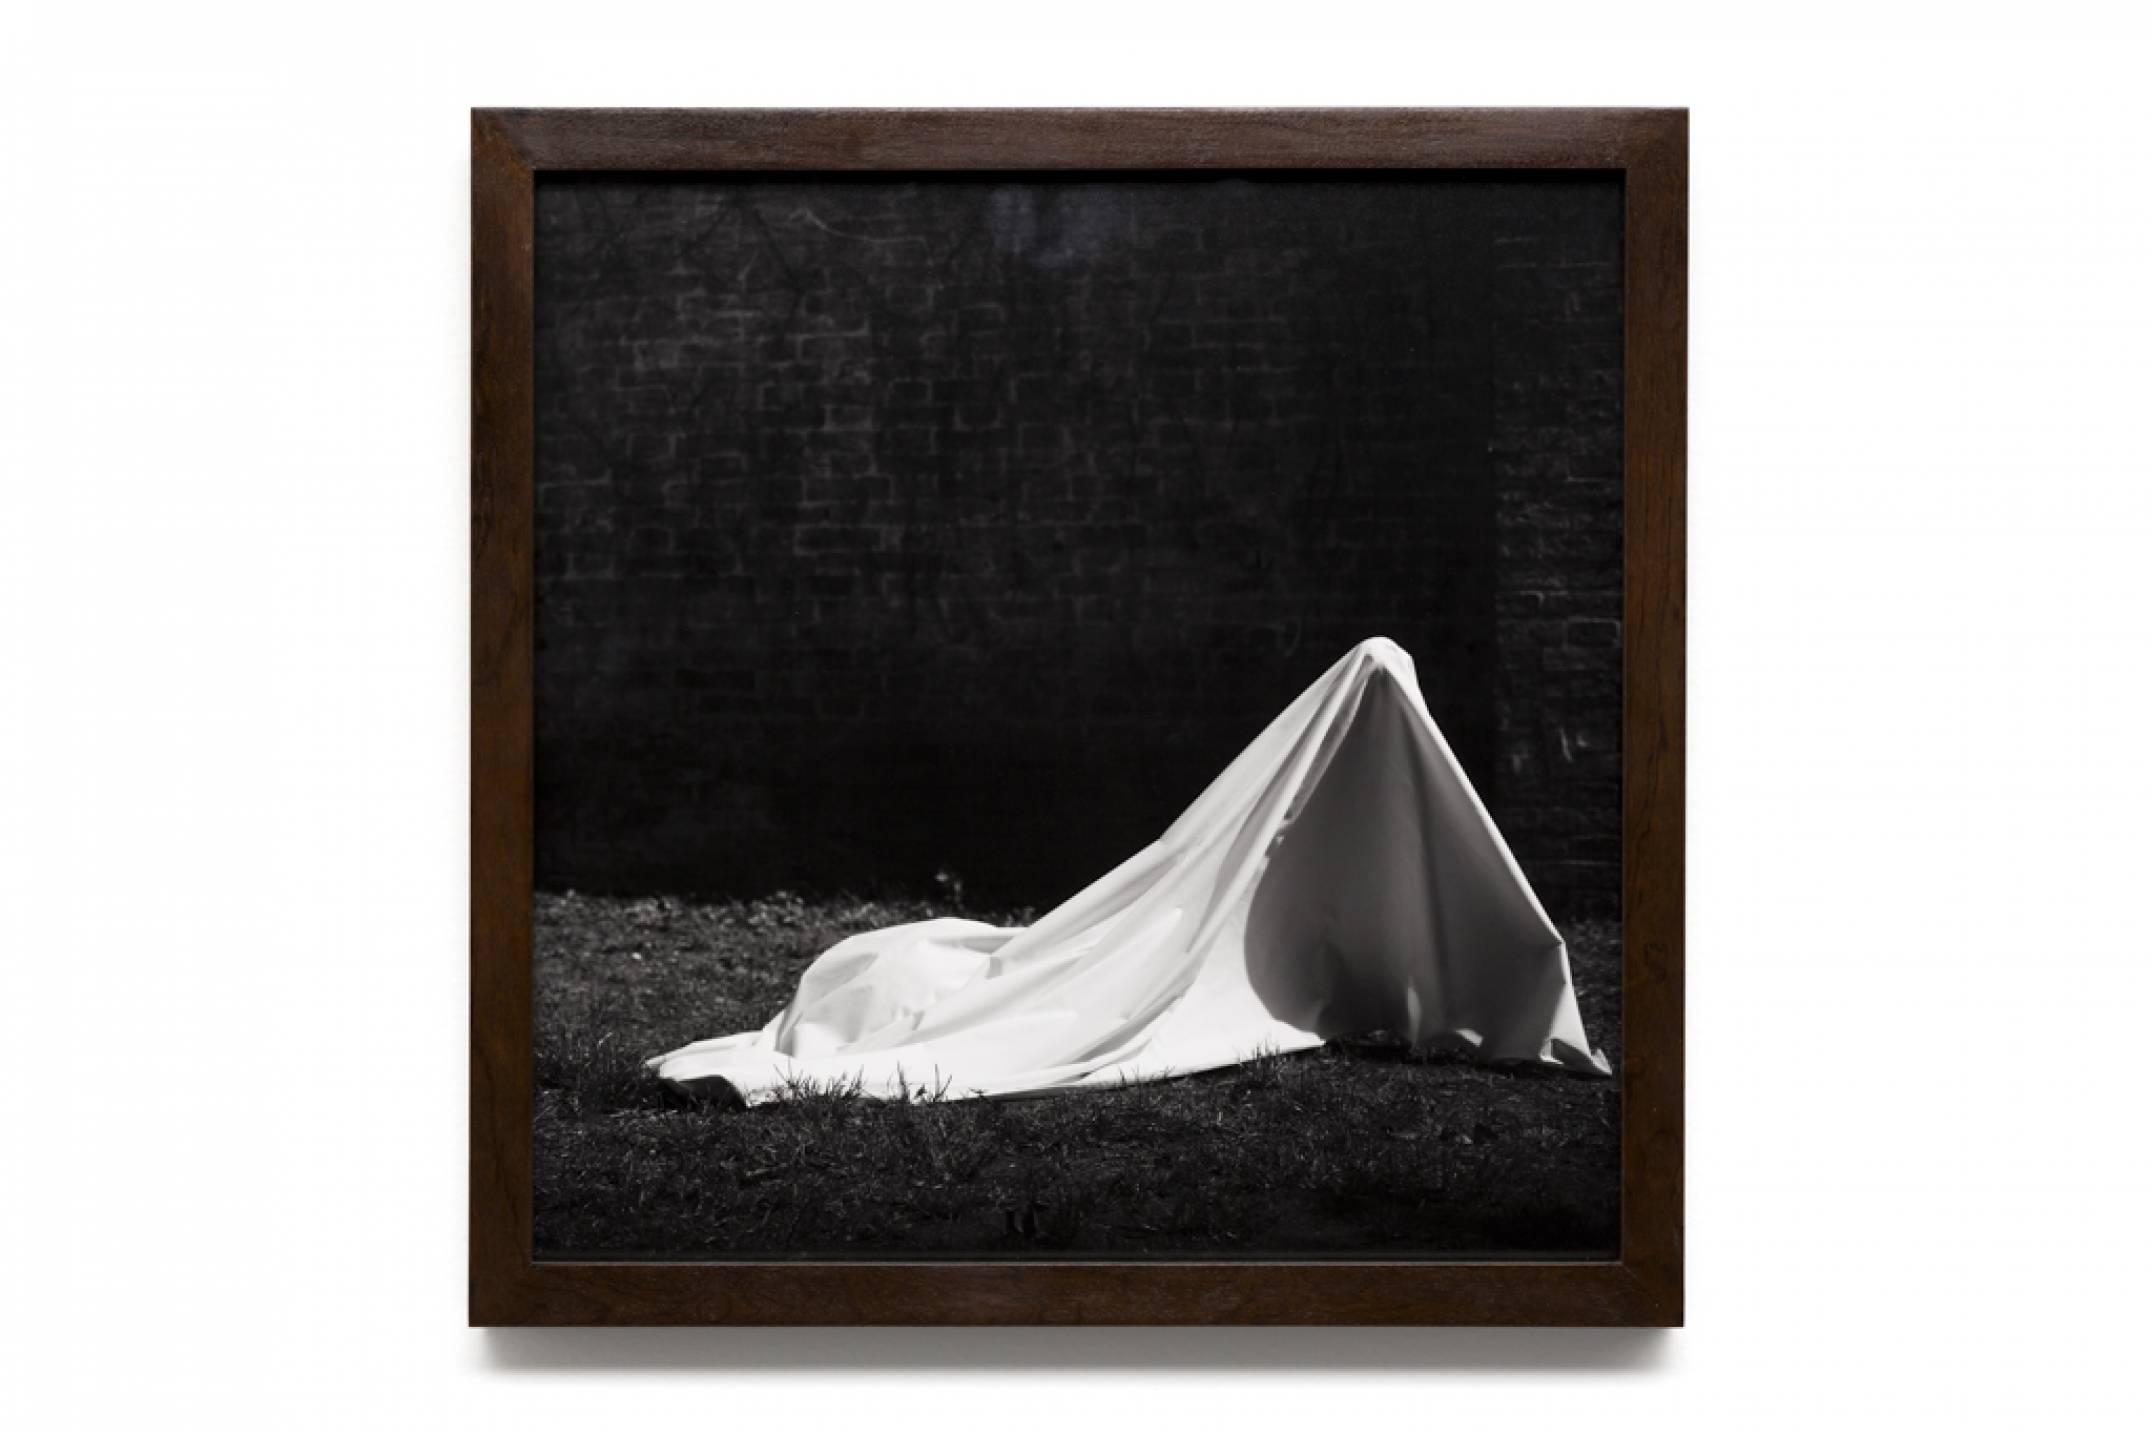 Luiz Roque &amp; Erika Verzutti,&nbsp;<em>Gesso</em>, 2017, photograph, 36,5 × 36,5 cm - Mendes Wood DM